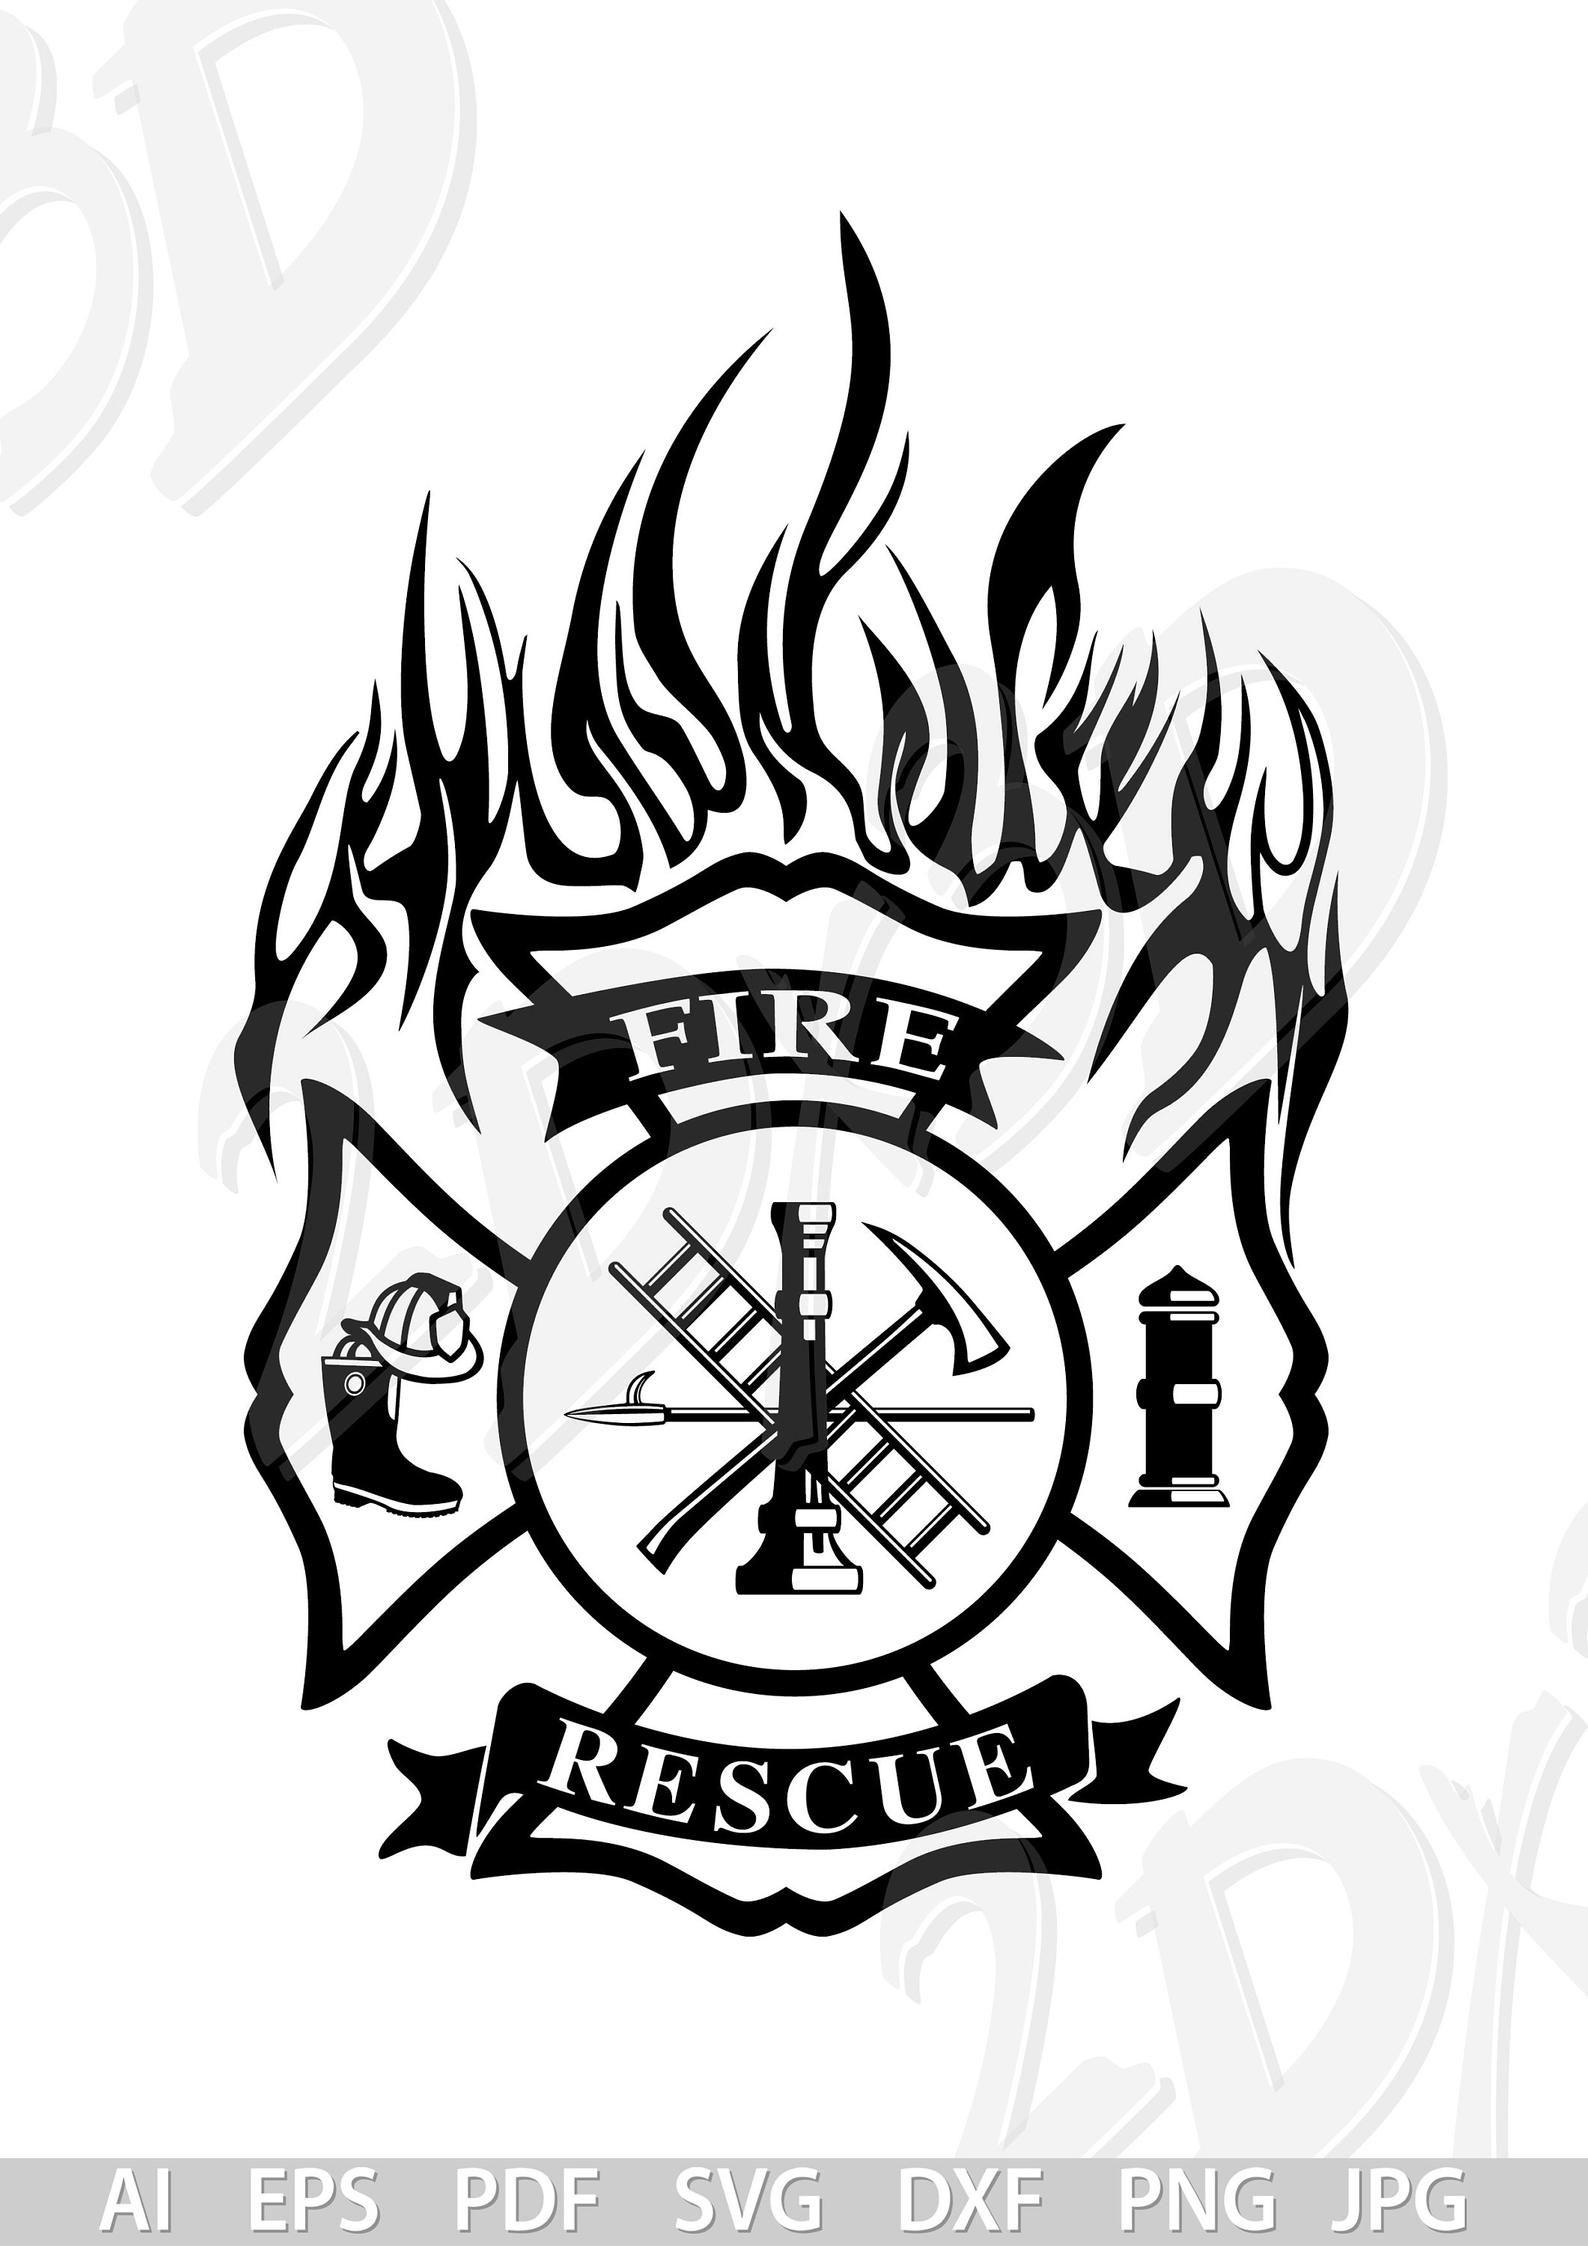 Vector Fire Fighter Fire Ai Eps Pdf Jpg Svg Png Etsy In 2021 Fire Fighter Tattoos Firefighter Firefighter Logo